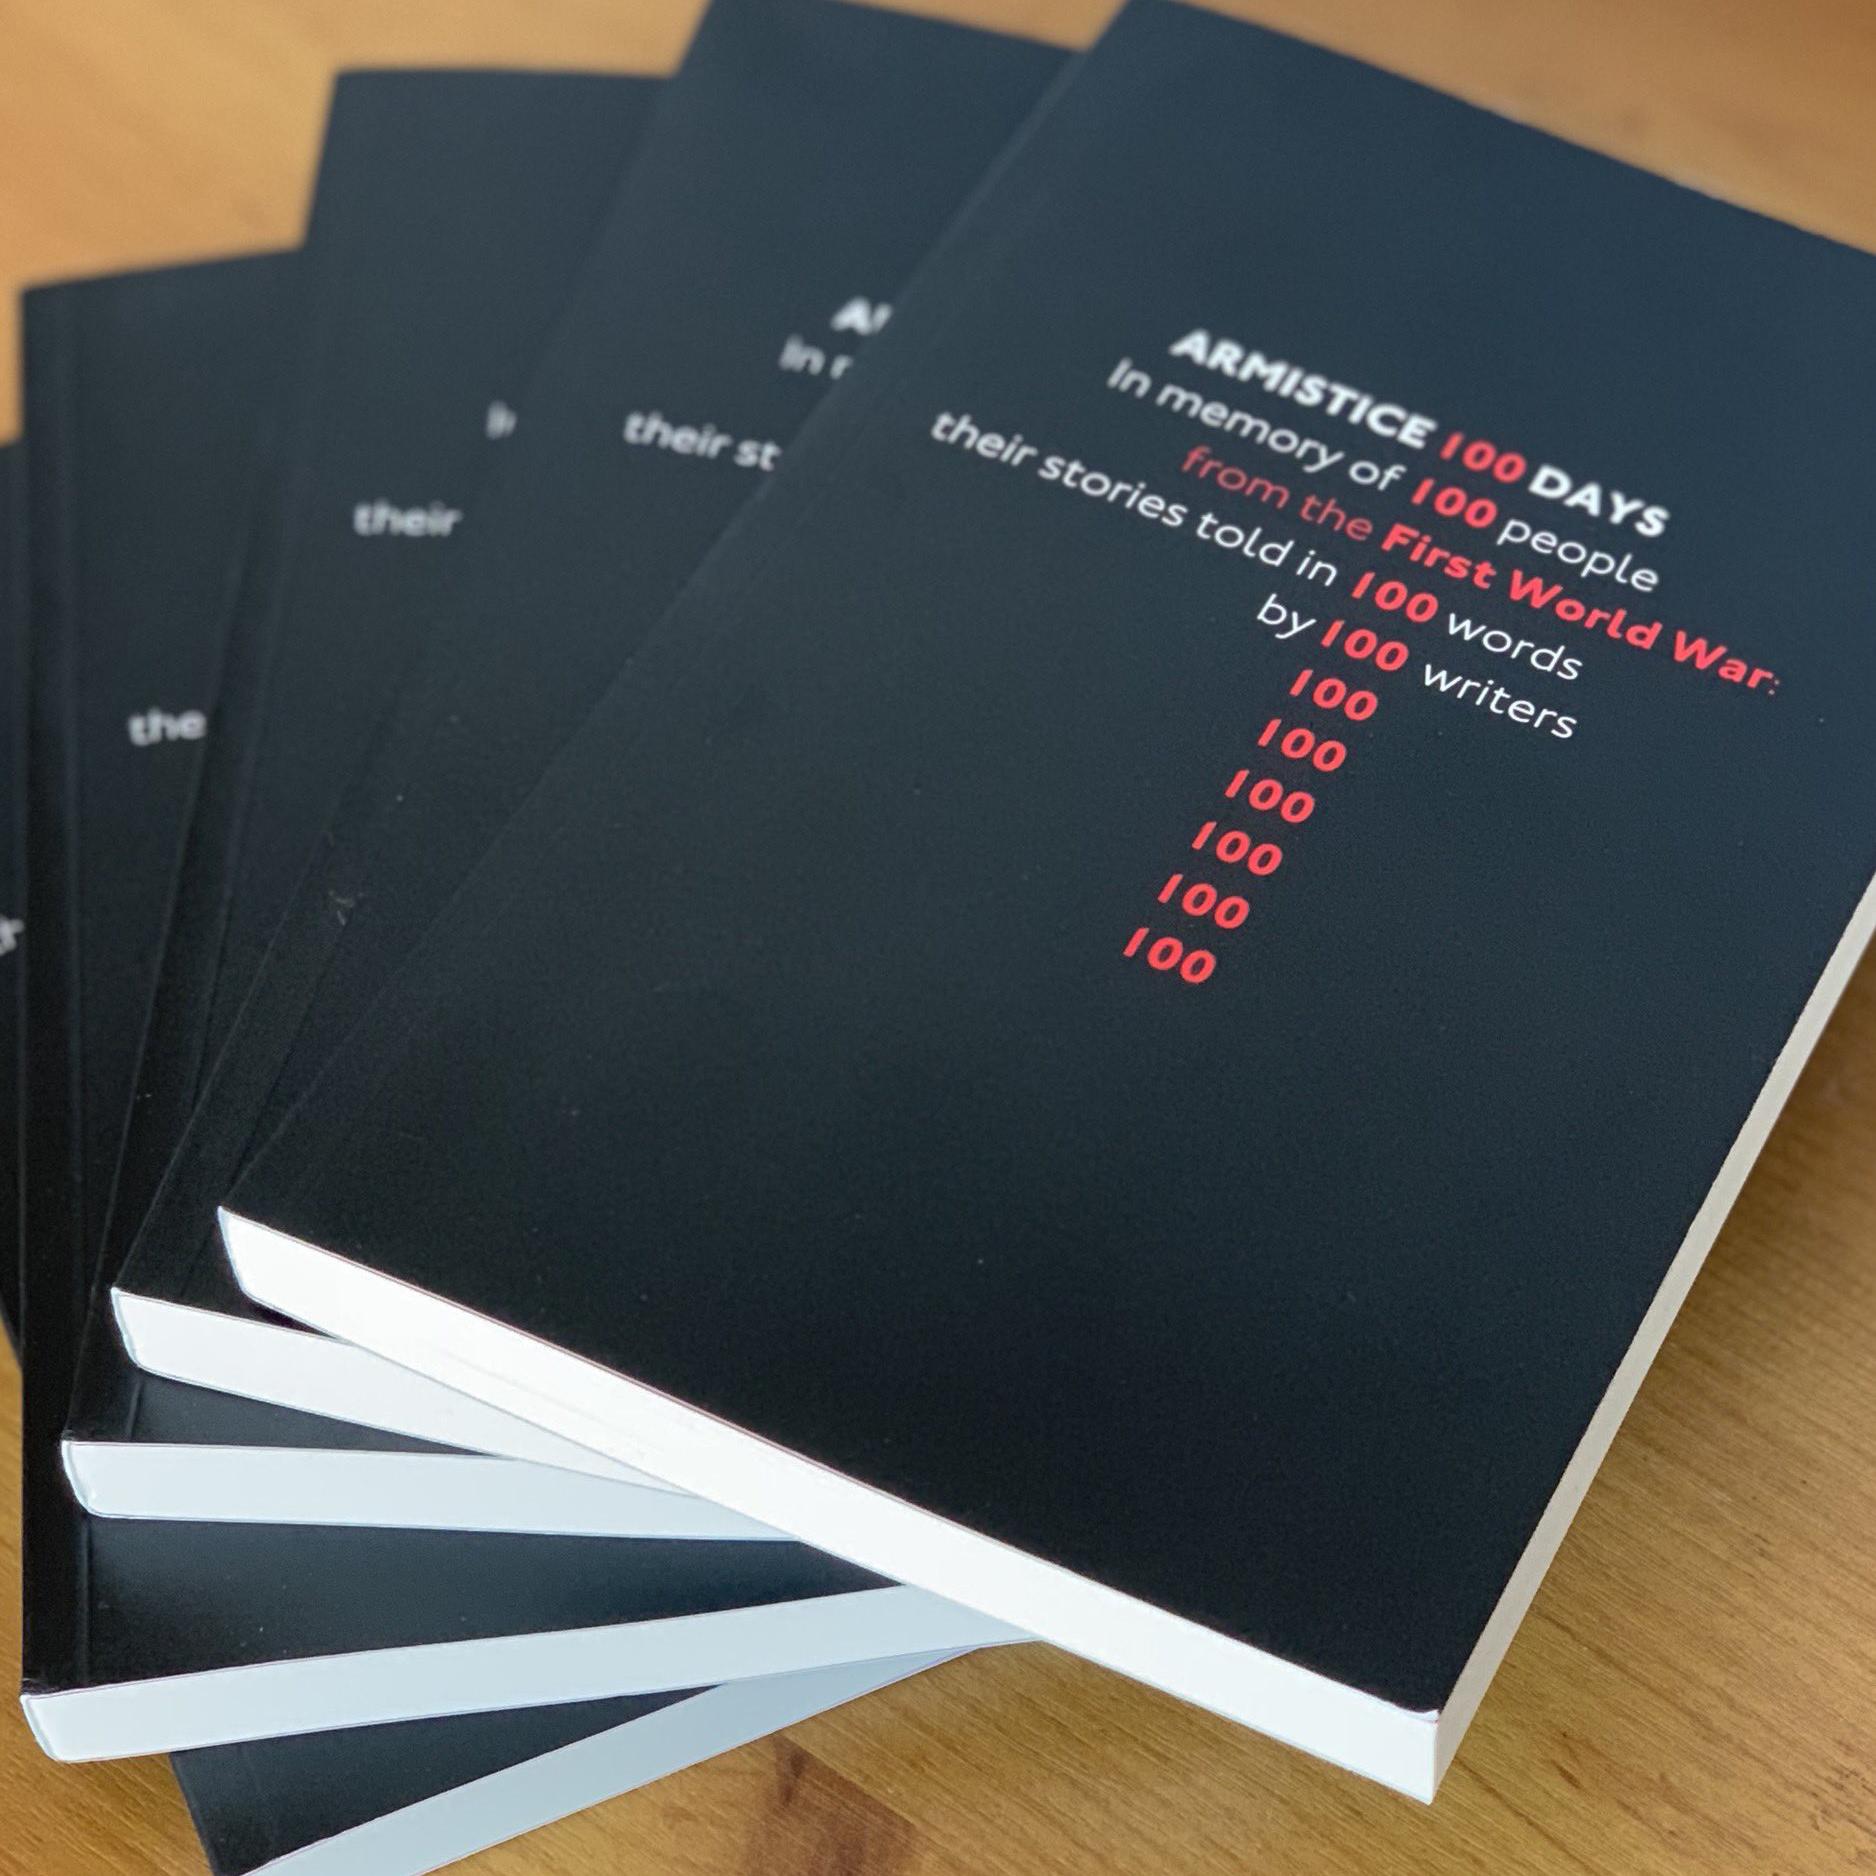 Armistice-book.jpg